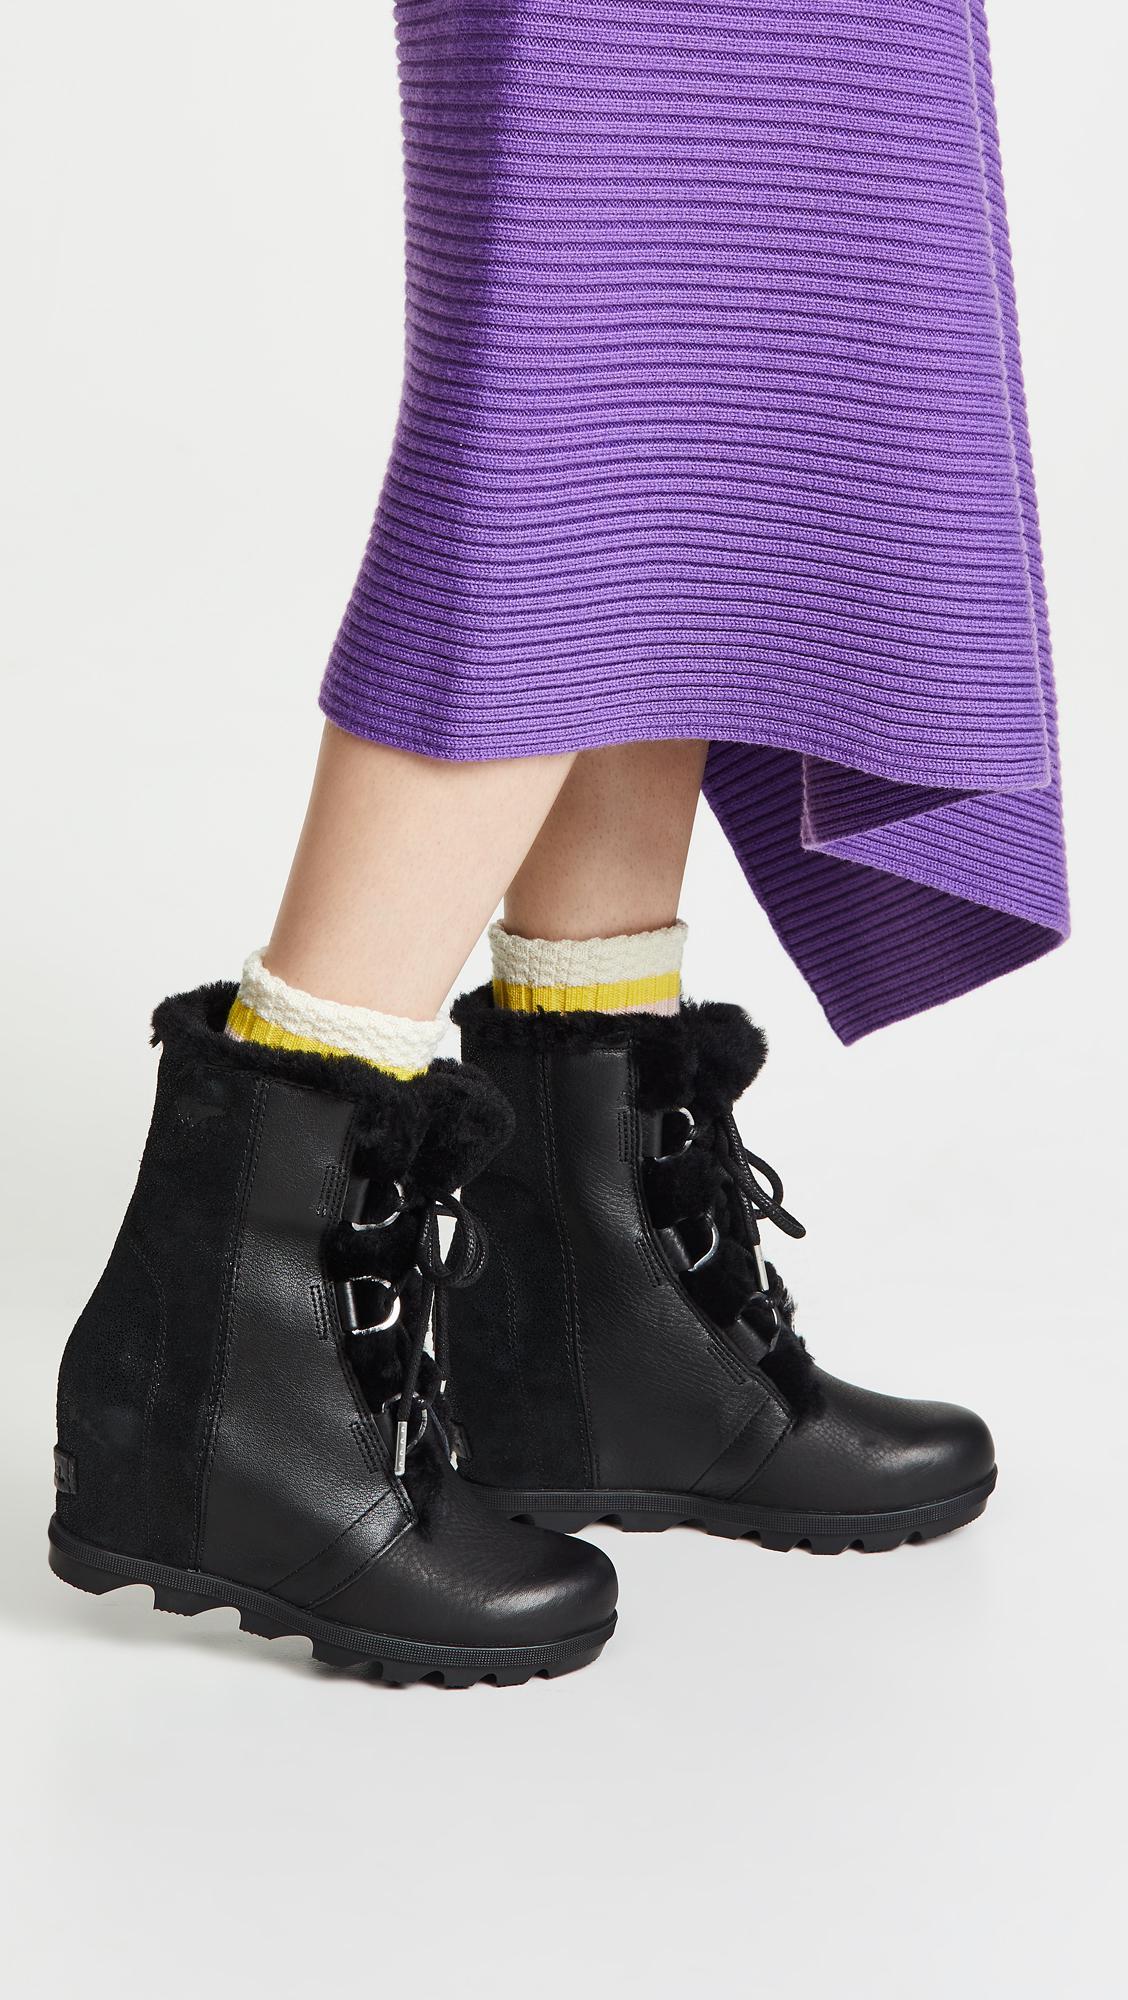 69be741c473 Sorel - Black Joan Of Arctic Wedge Ii Shearling Boots - Lyst. View  fullscreen